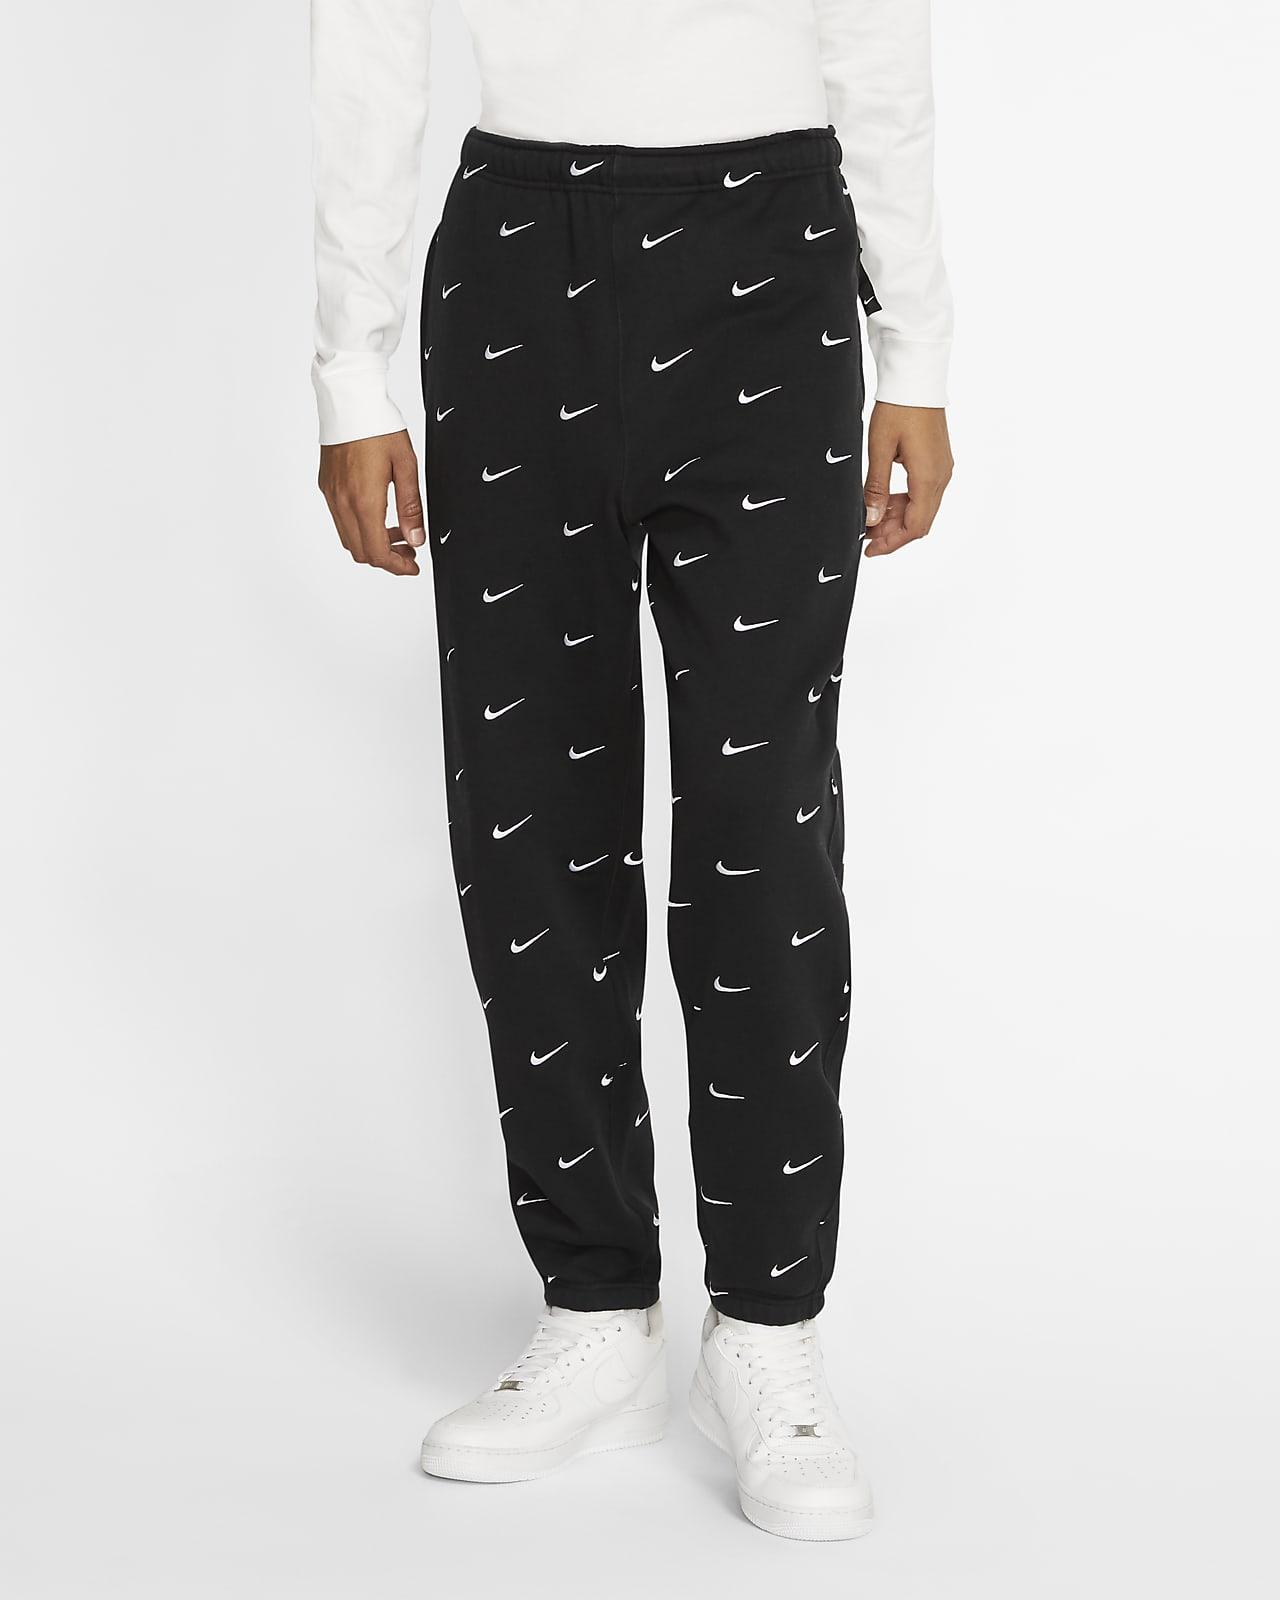 Nike Men's Swoosh Logo Pants